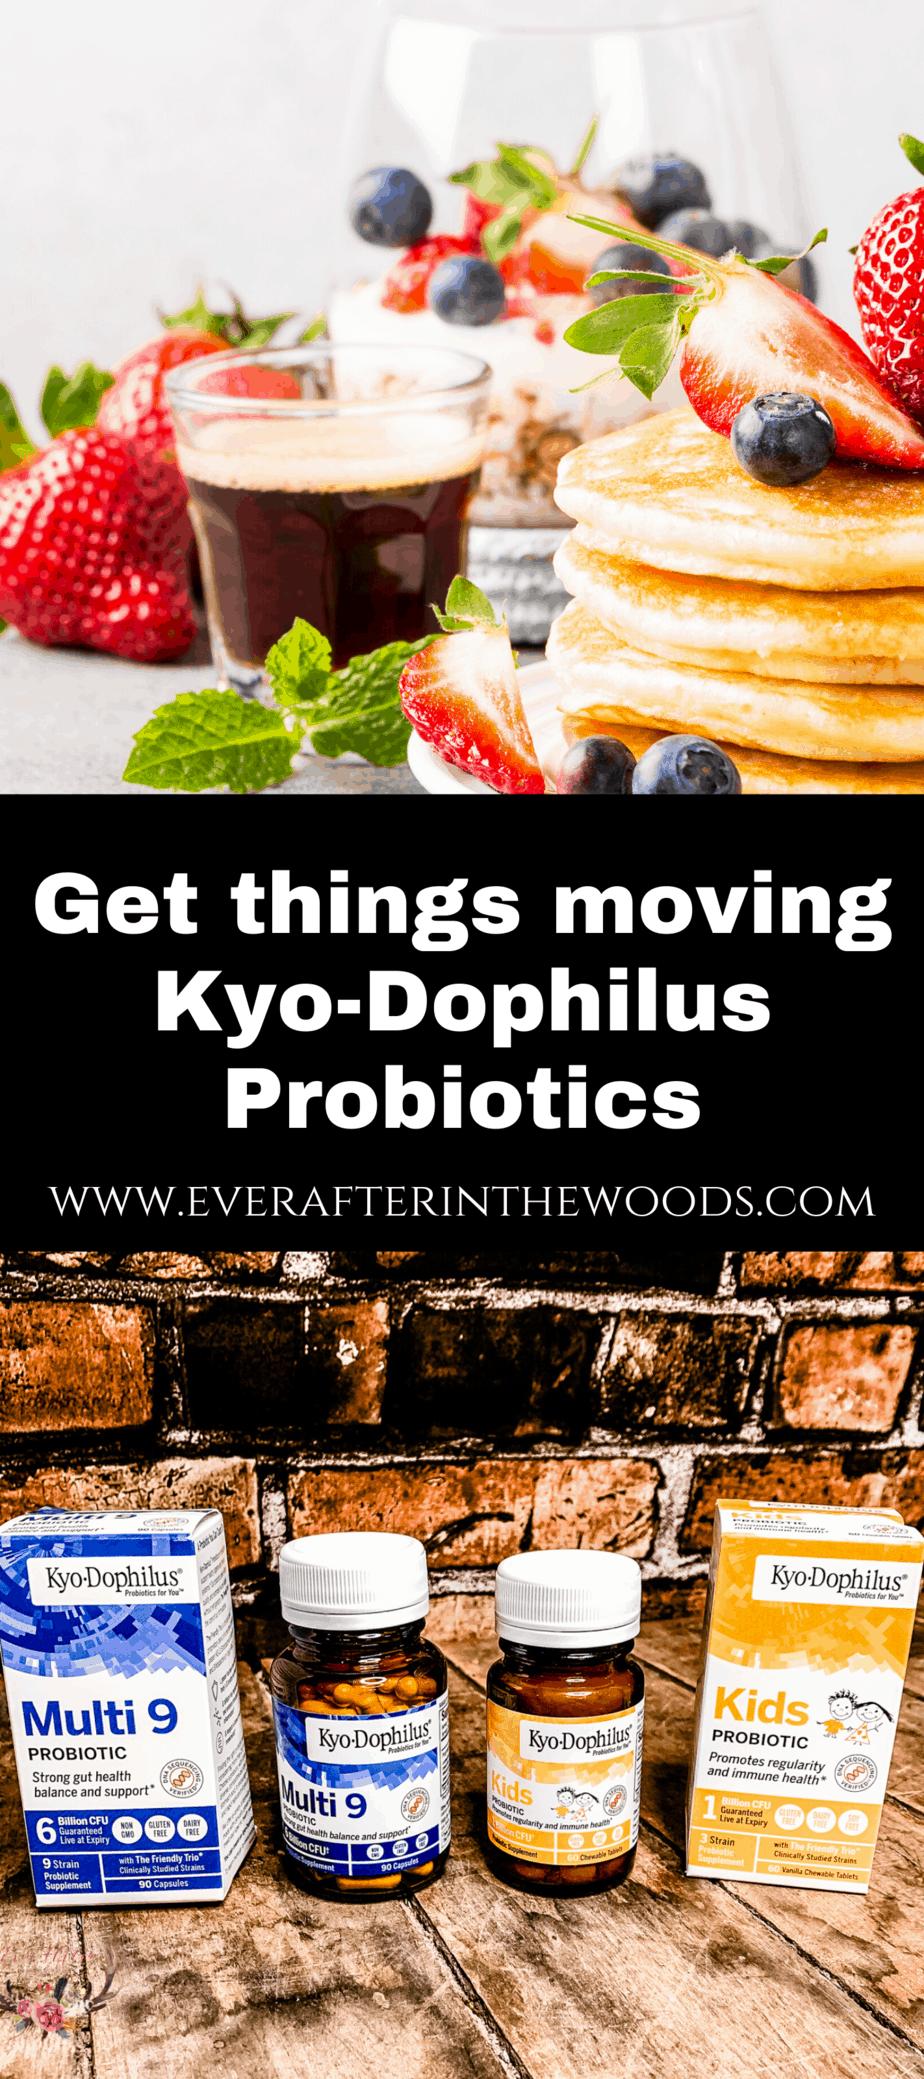 Kyo-Dophilus Probiotics